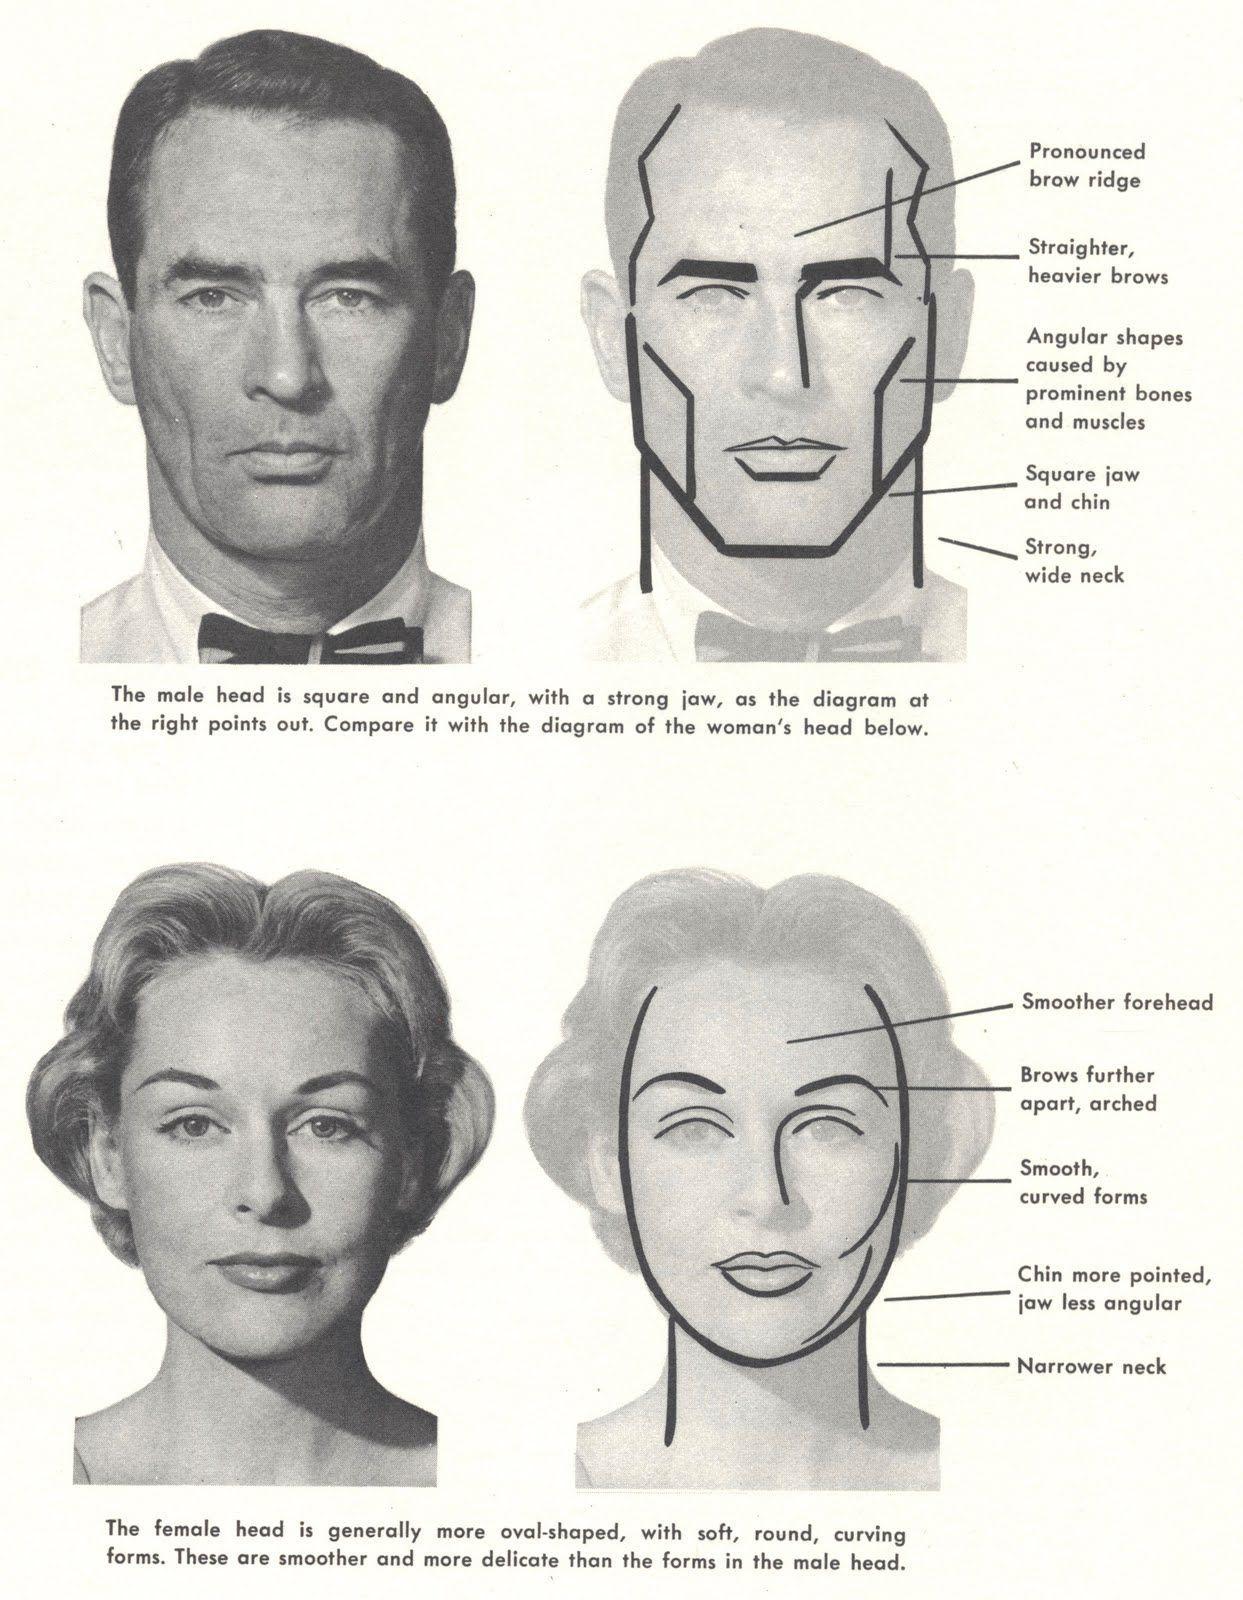 resultado de imagen para male female face differences draw drawing